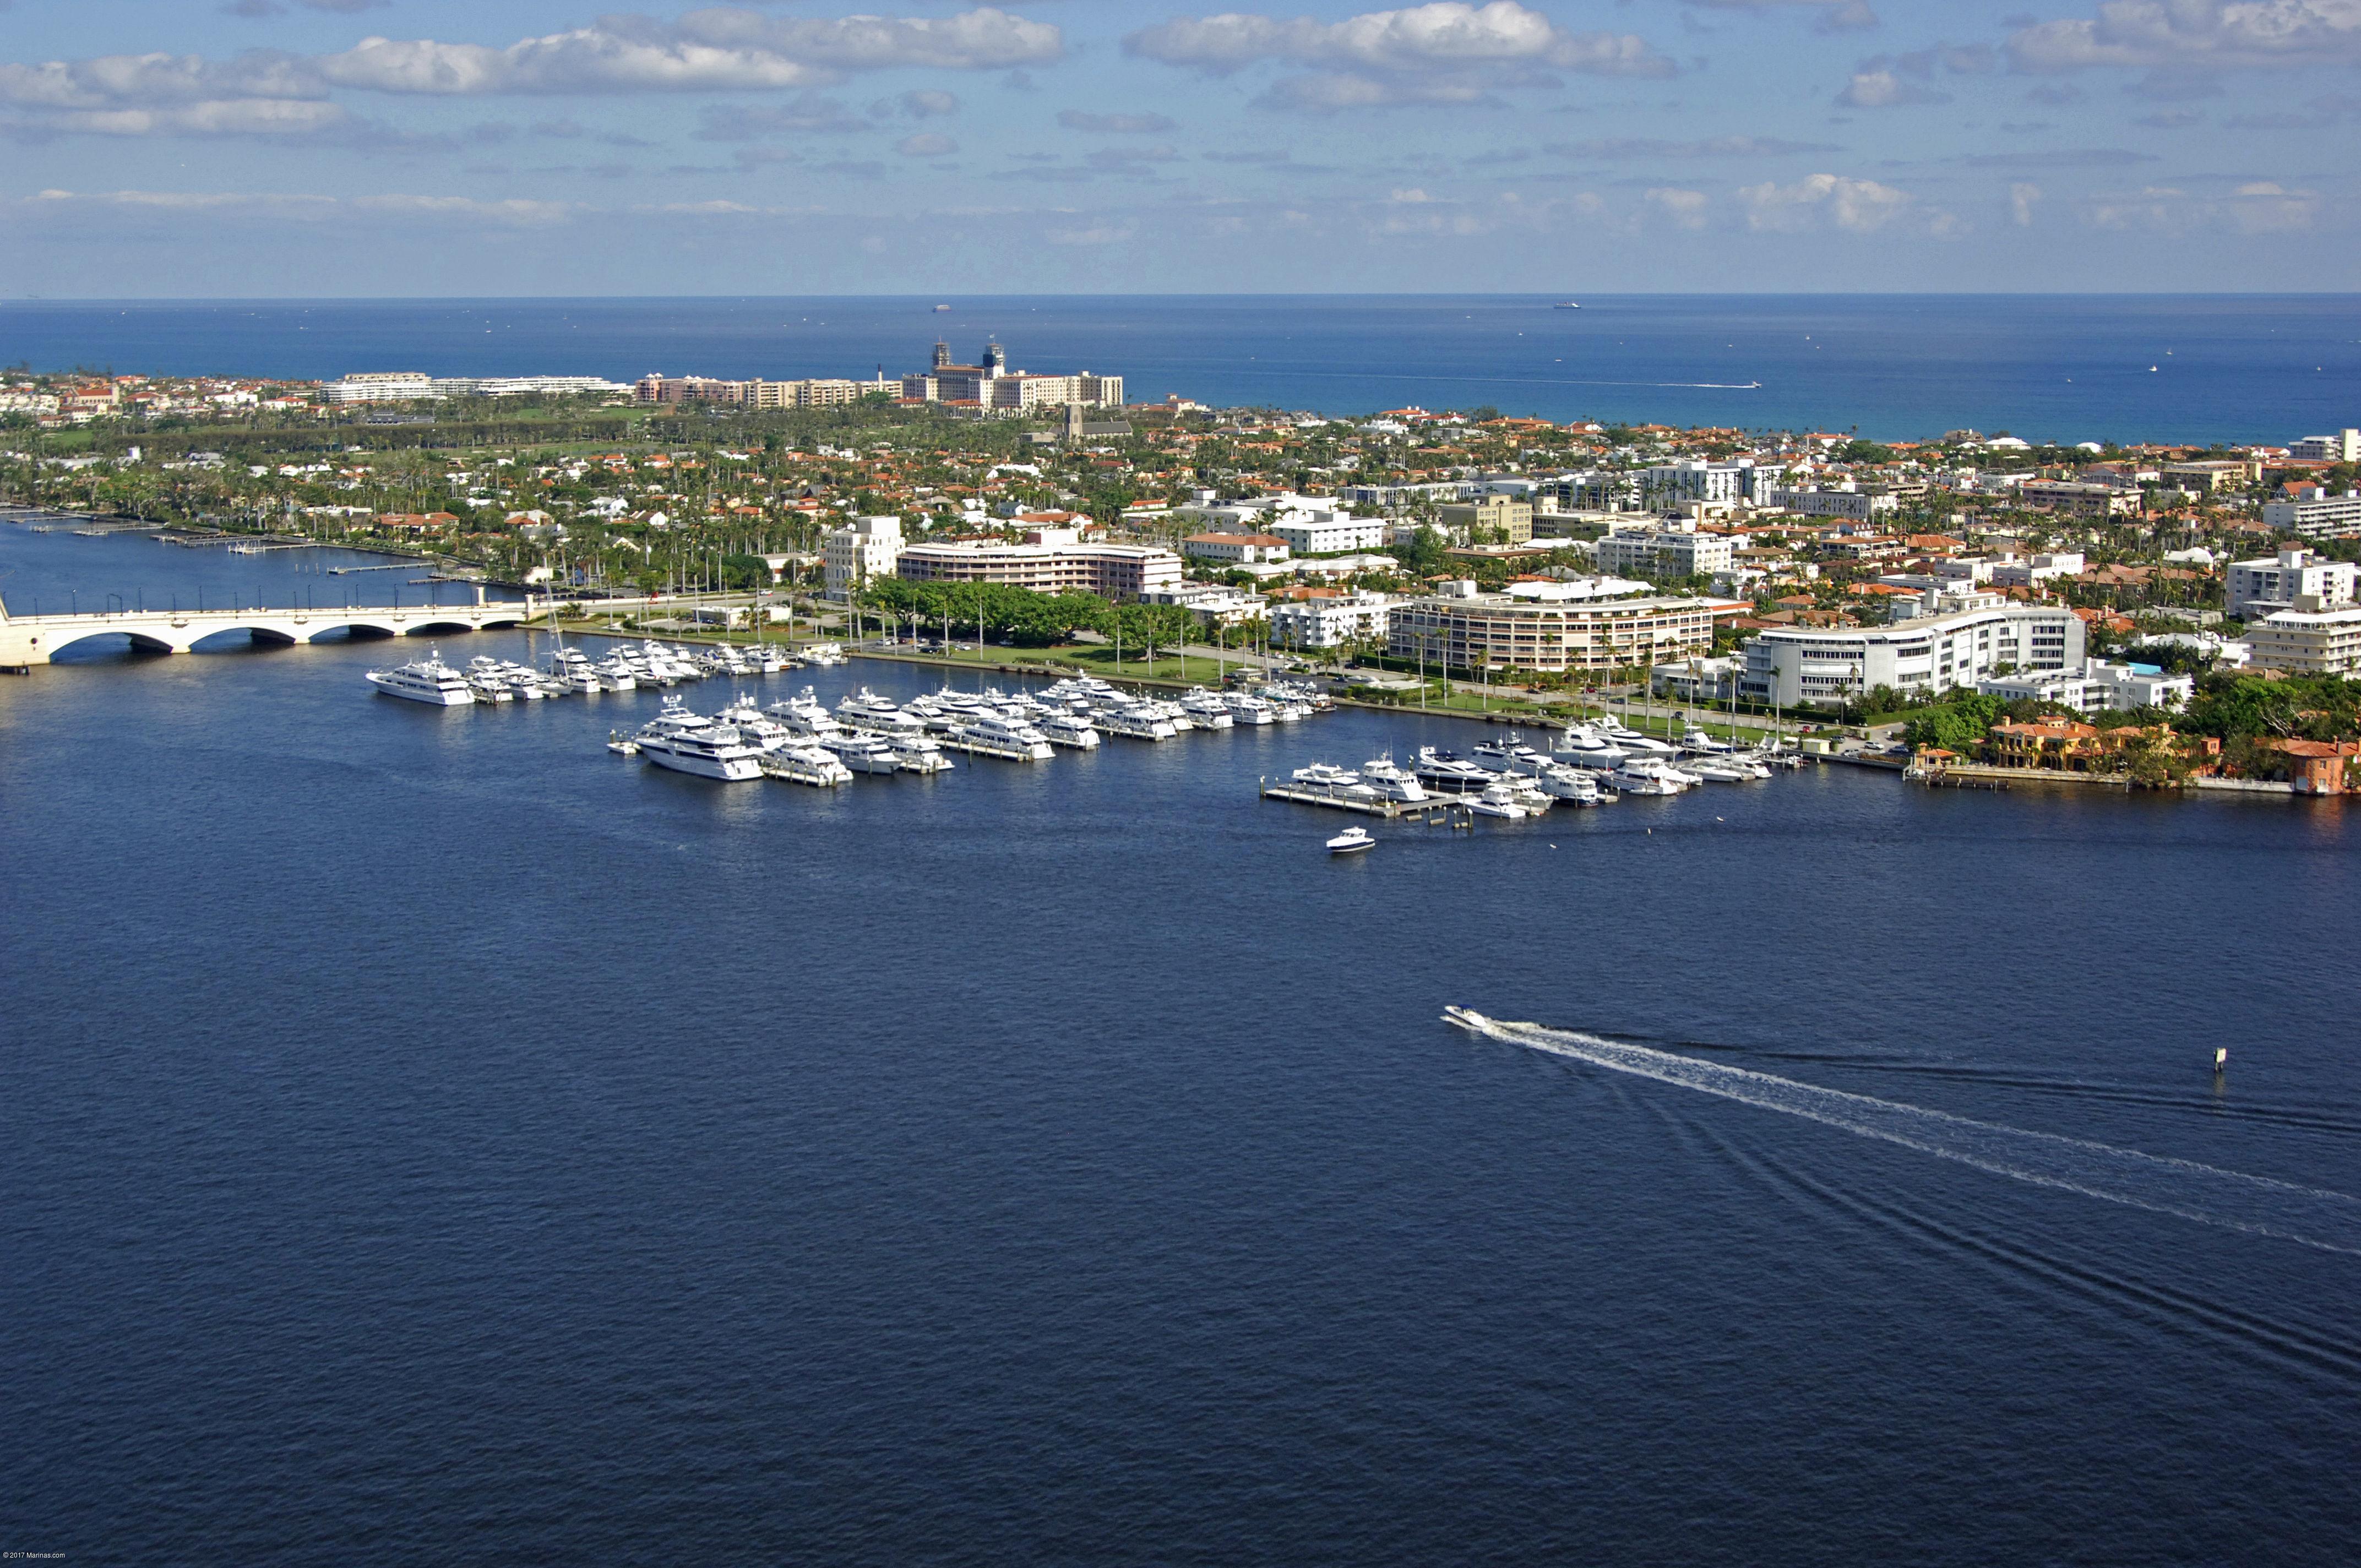 New Port Cove Riviera Beach